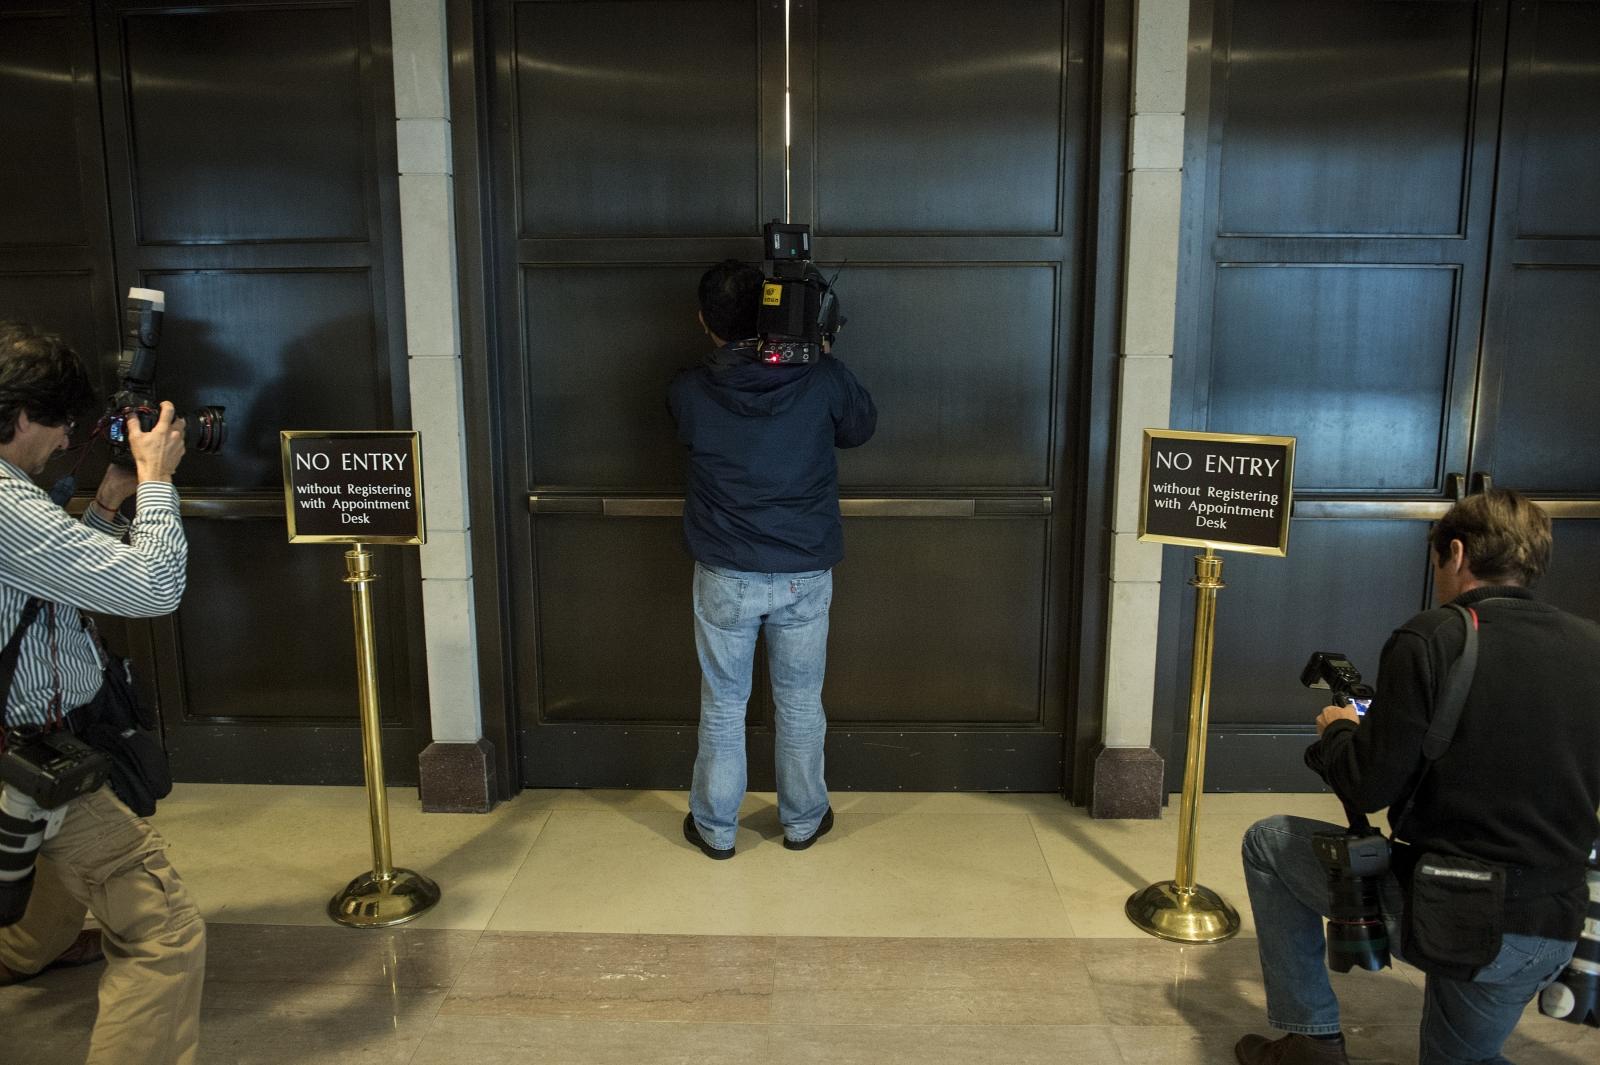 Cameraman tries to see through door crack